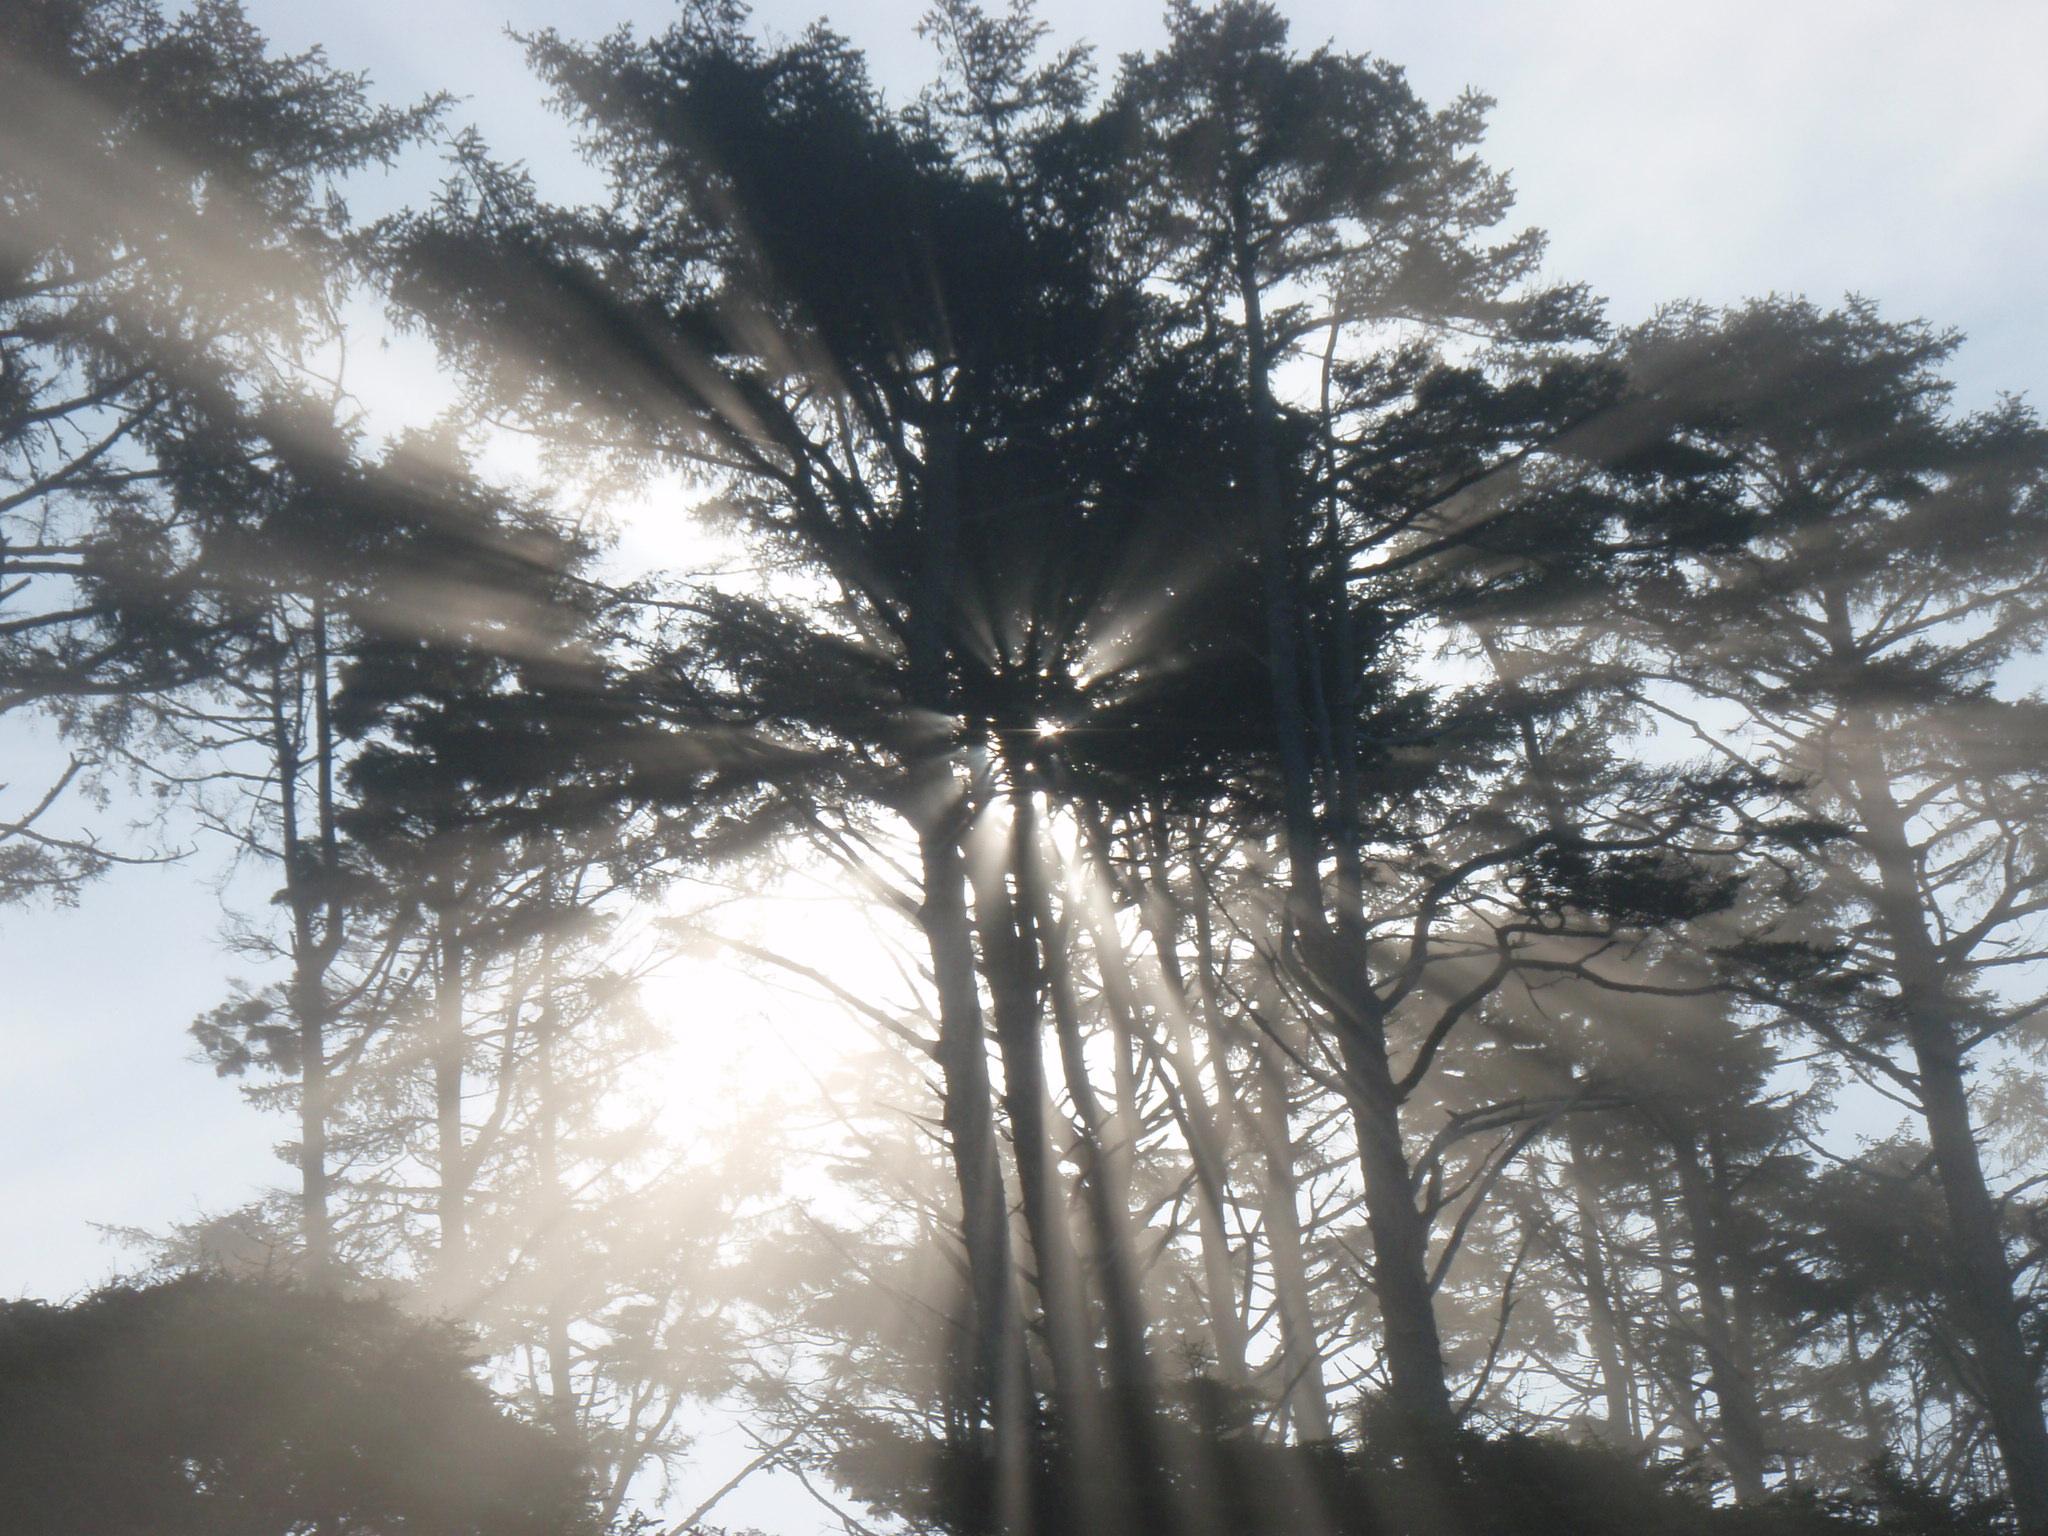 Morning rays of sun on Pacific Coastline in Washington State